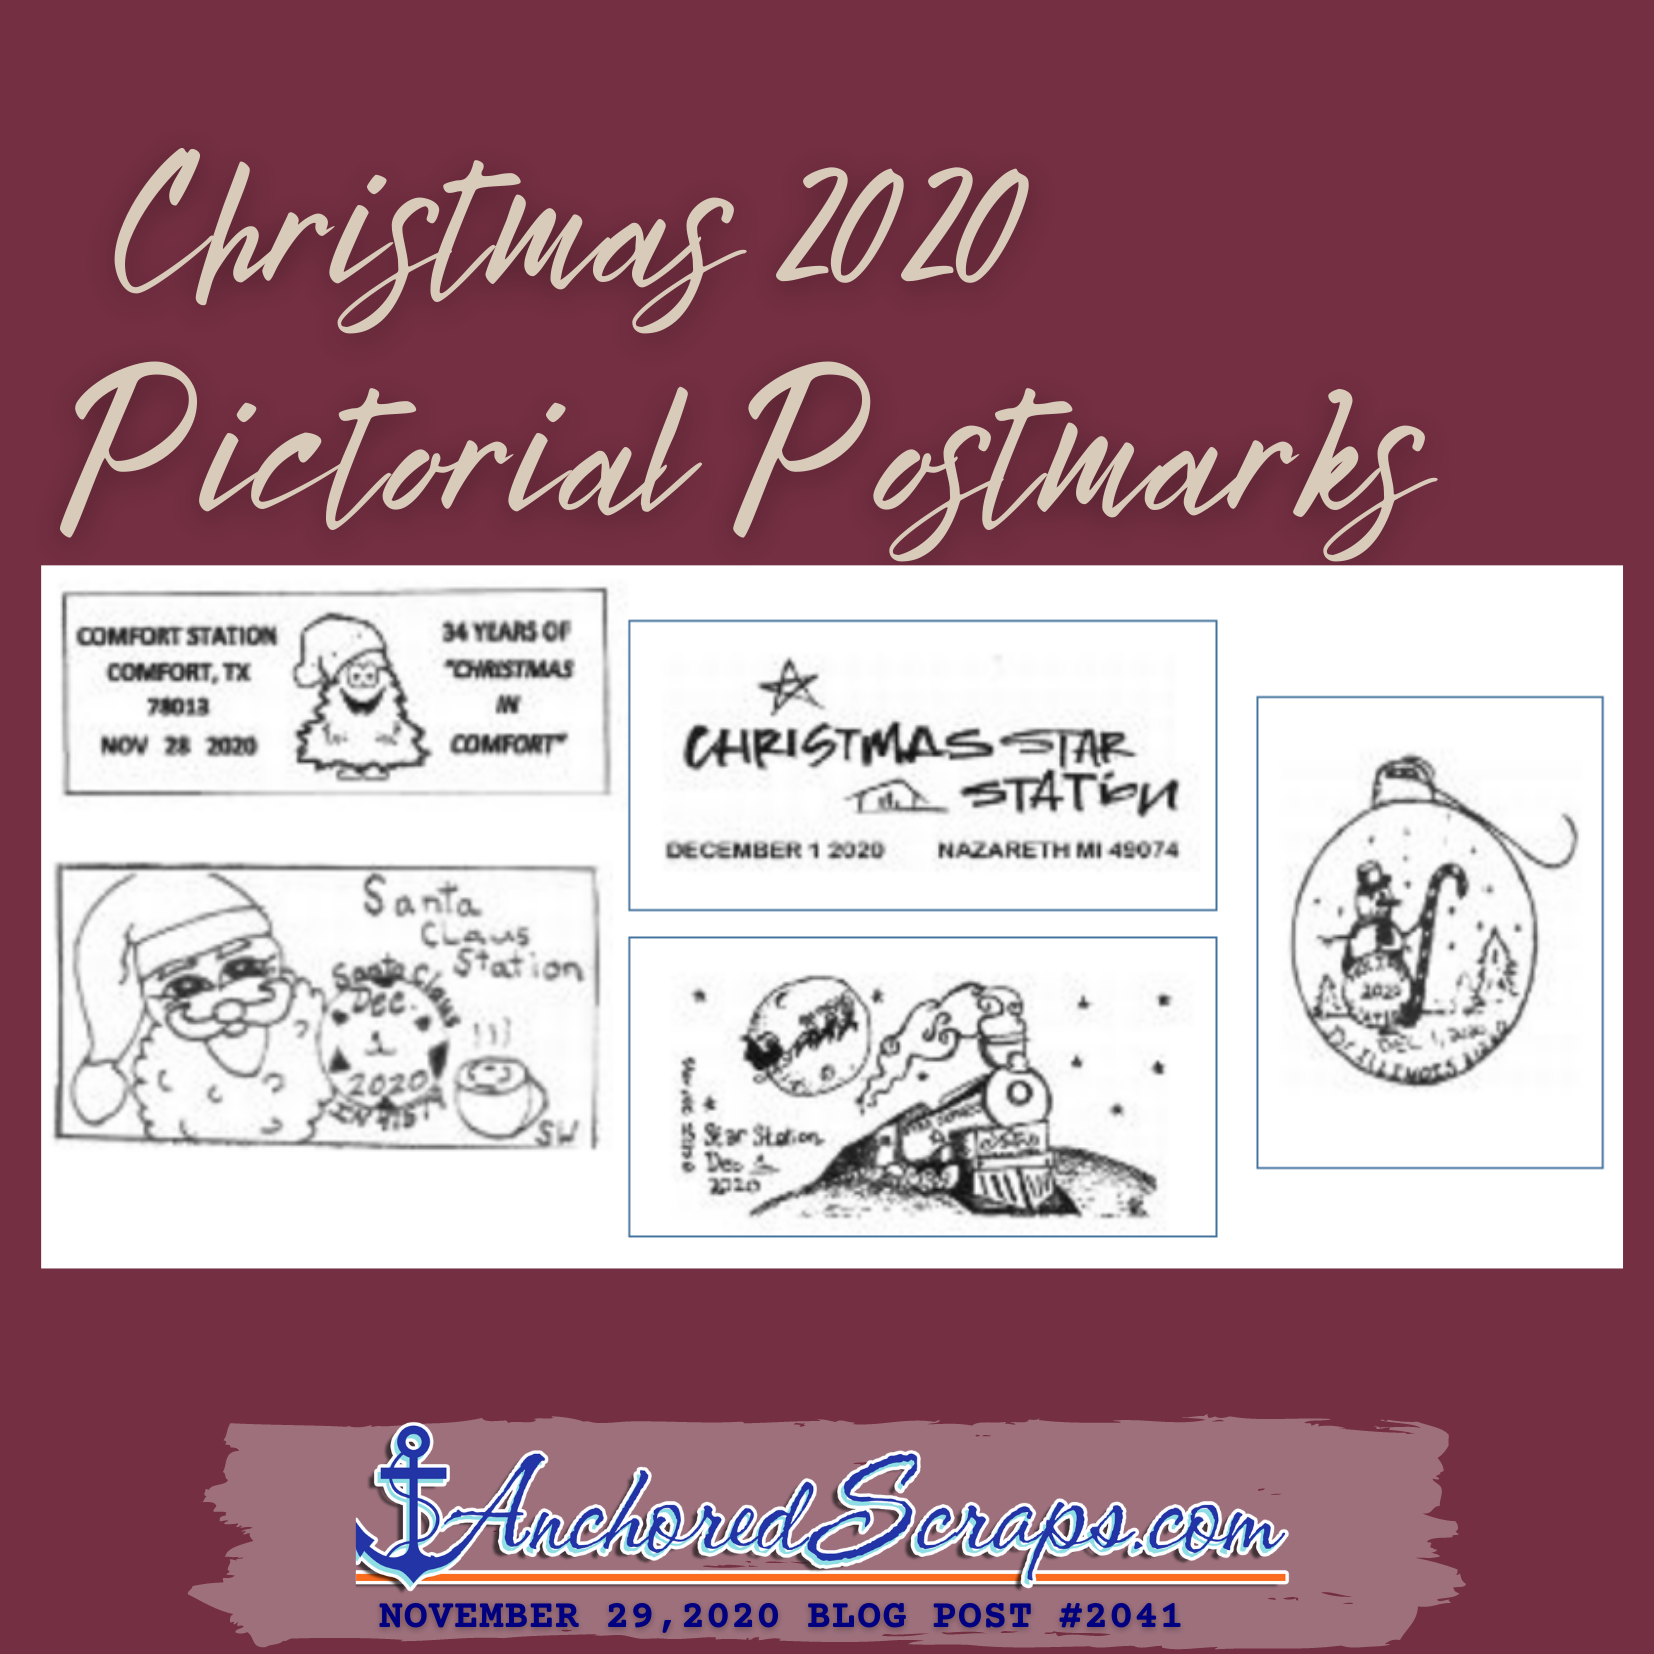 Christmas 2020 Pictorial Postmarks